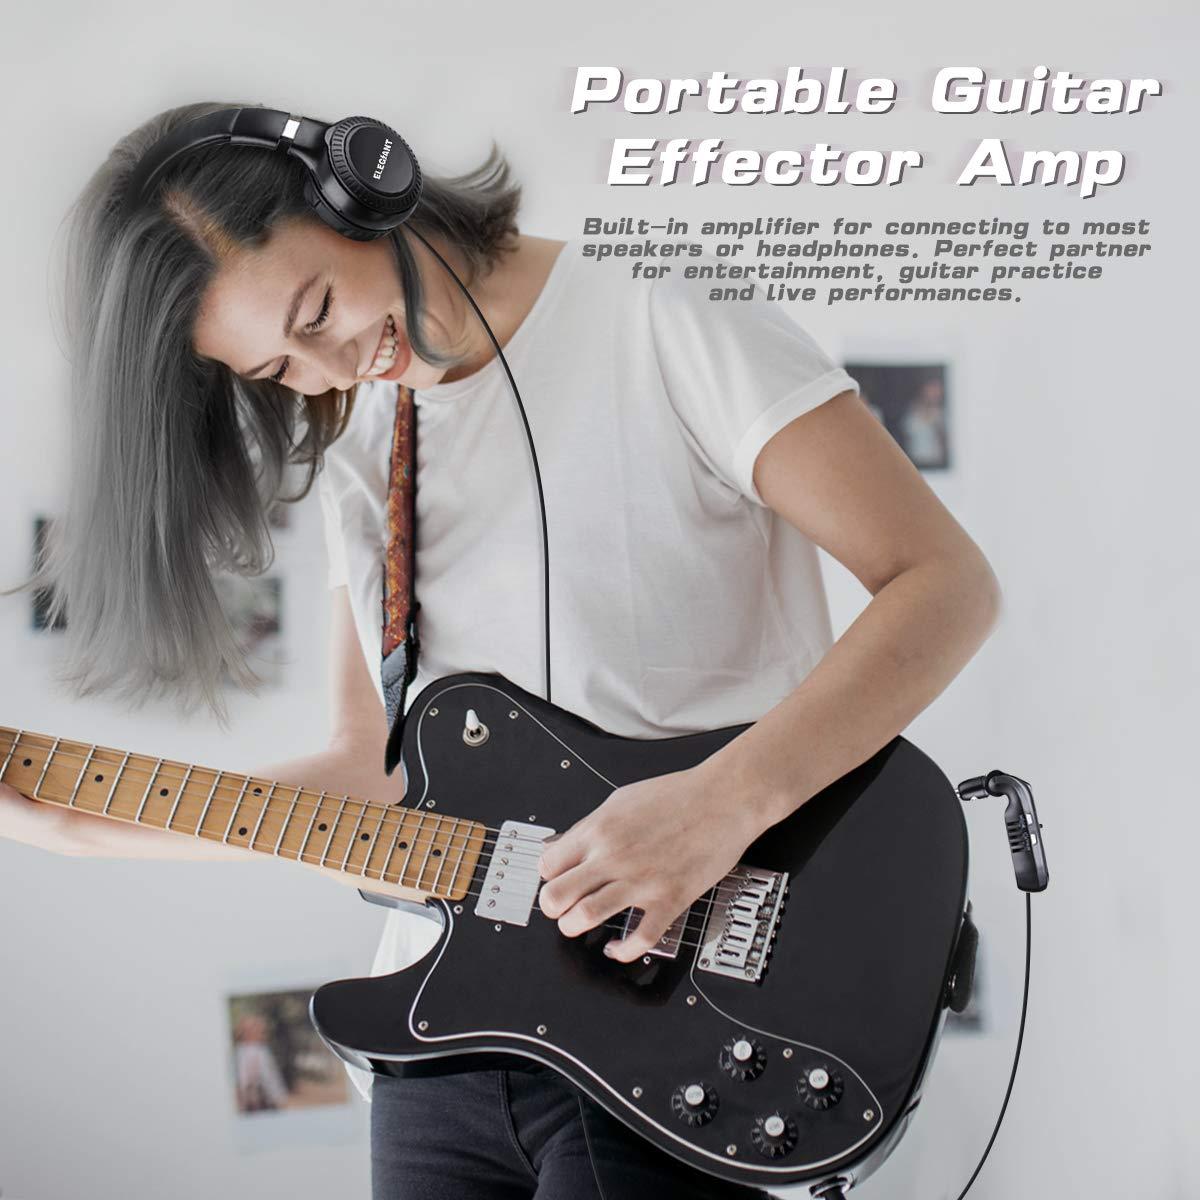 ELEGIANT Mini Amplificador de Guitarra Bluetooth, Transmisor Inalámbrico para Guitarra Eléctrica de Audio Portátil Recargable Sintetizador 5 Efectos de ...